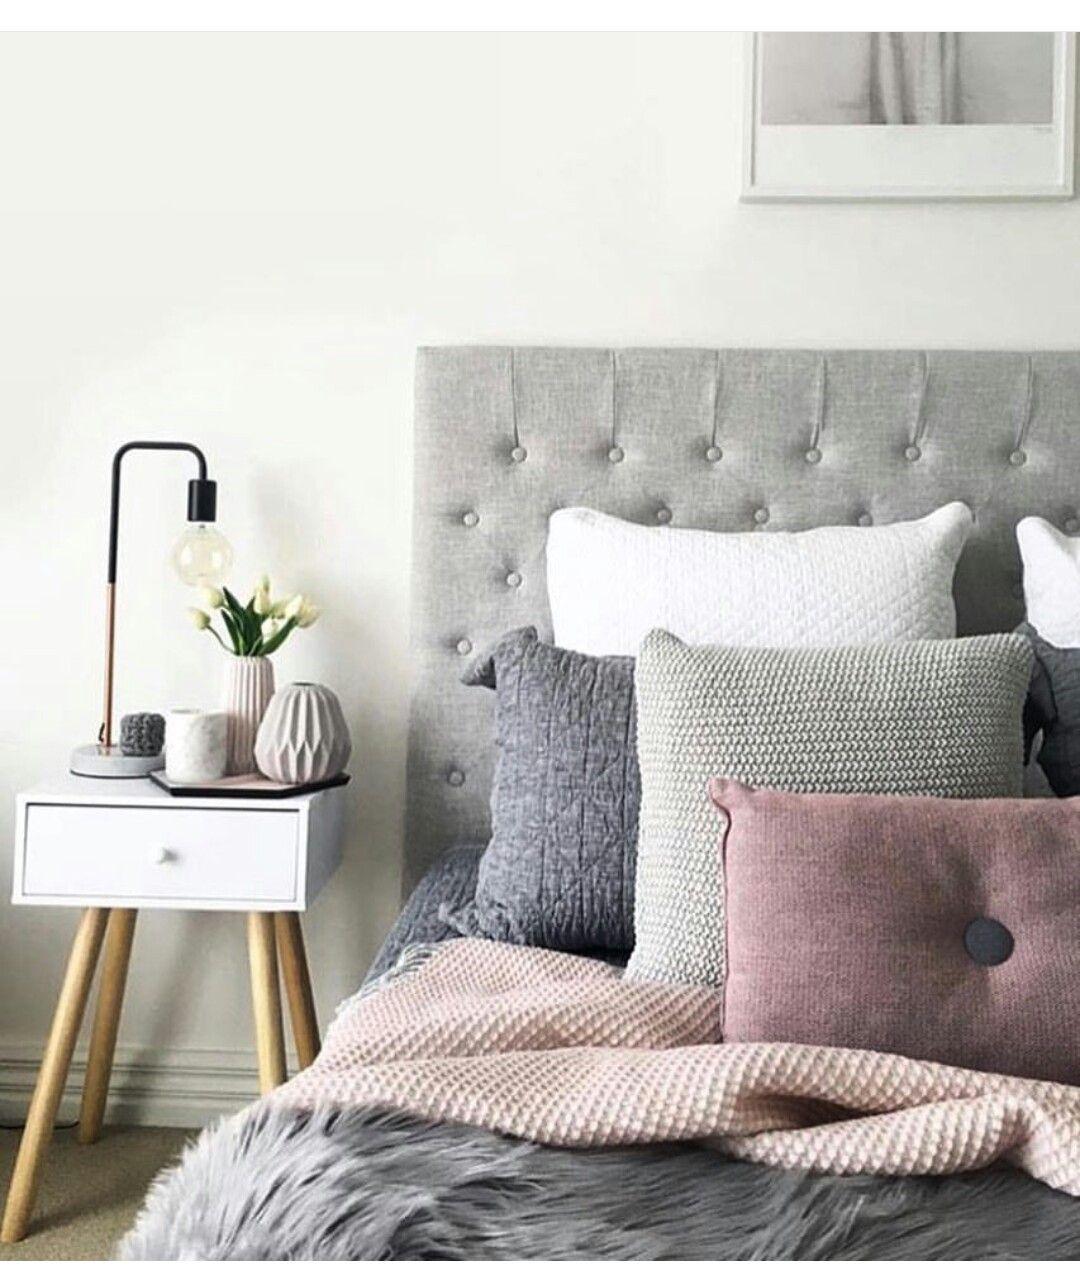 Bedroom Furniture Vanity Bedroom Colour Images Bedroom Decor Pink And Black Bedroom Color Ideas Neutral: Quarto Com Cabeceira Capitone Cinza.